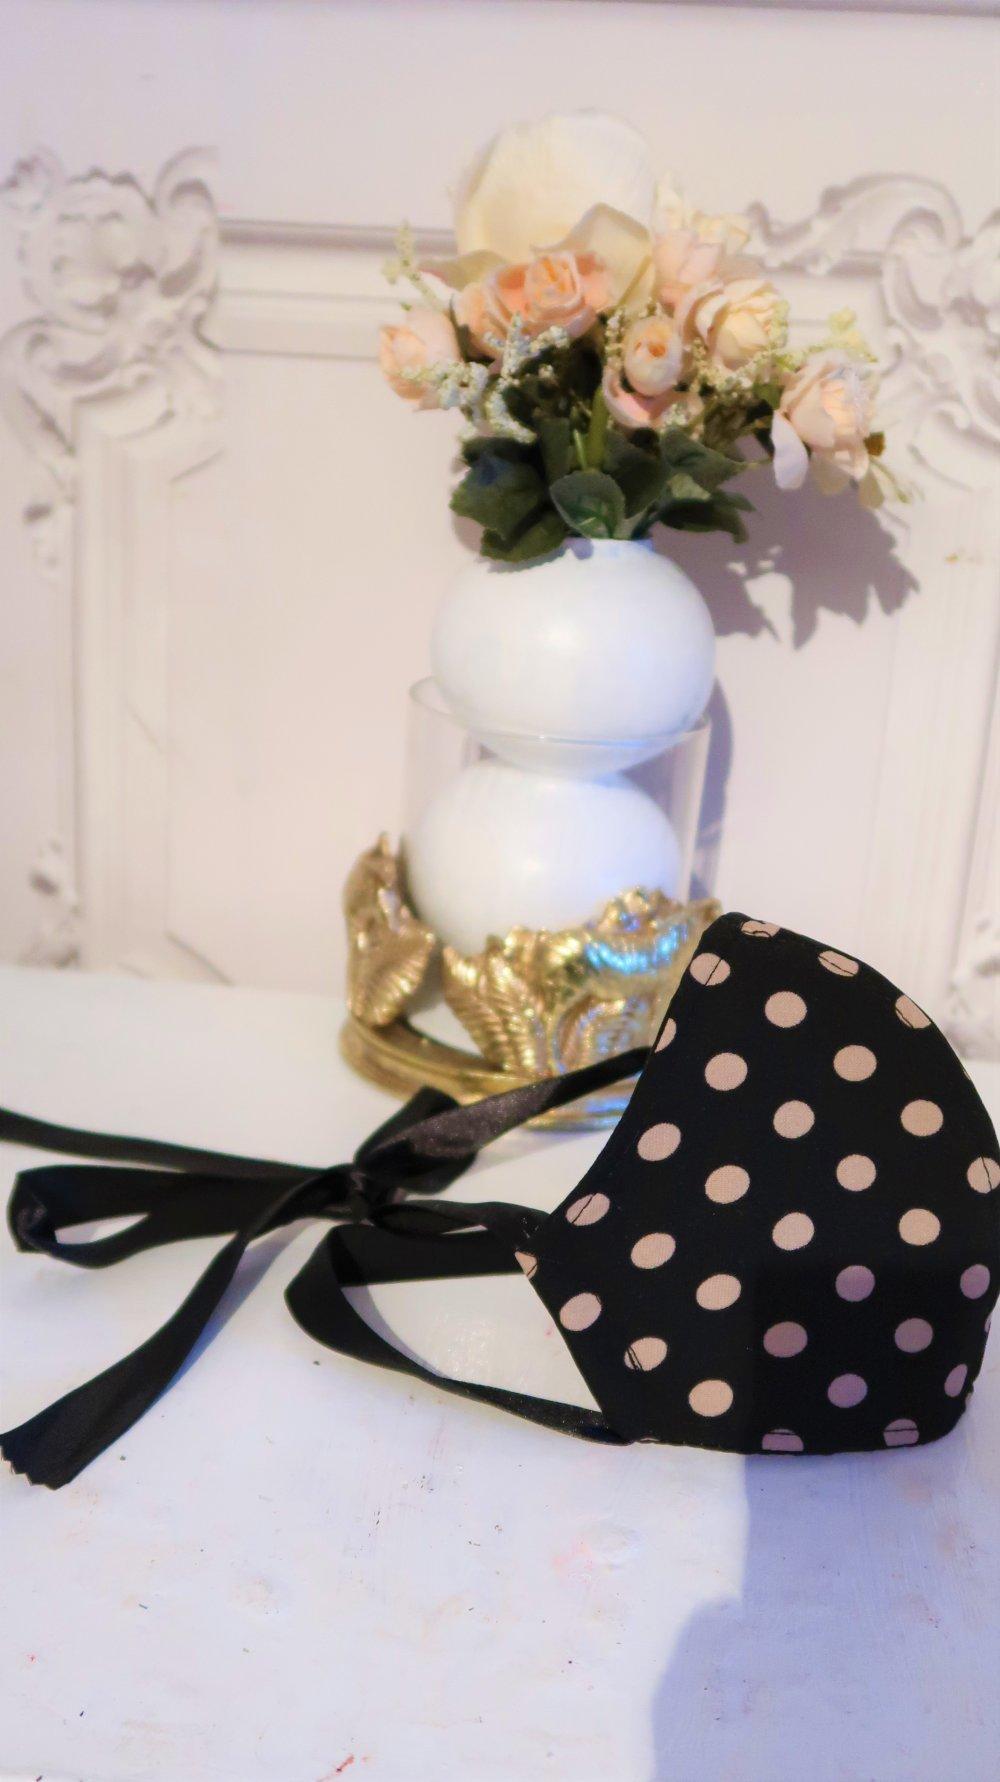 masque de protection masque en tissu